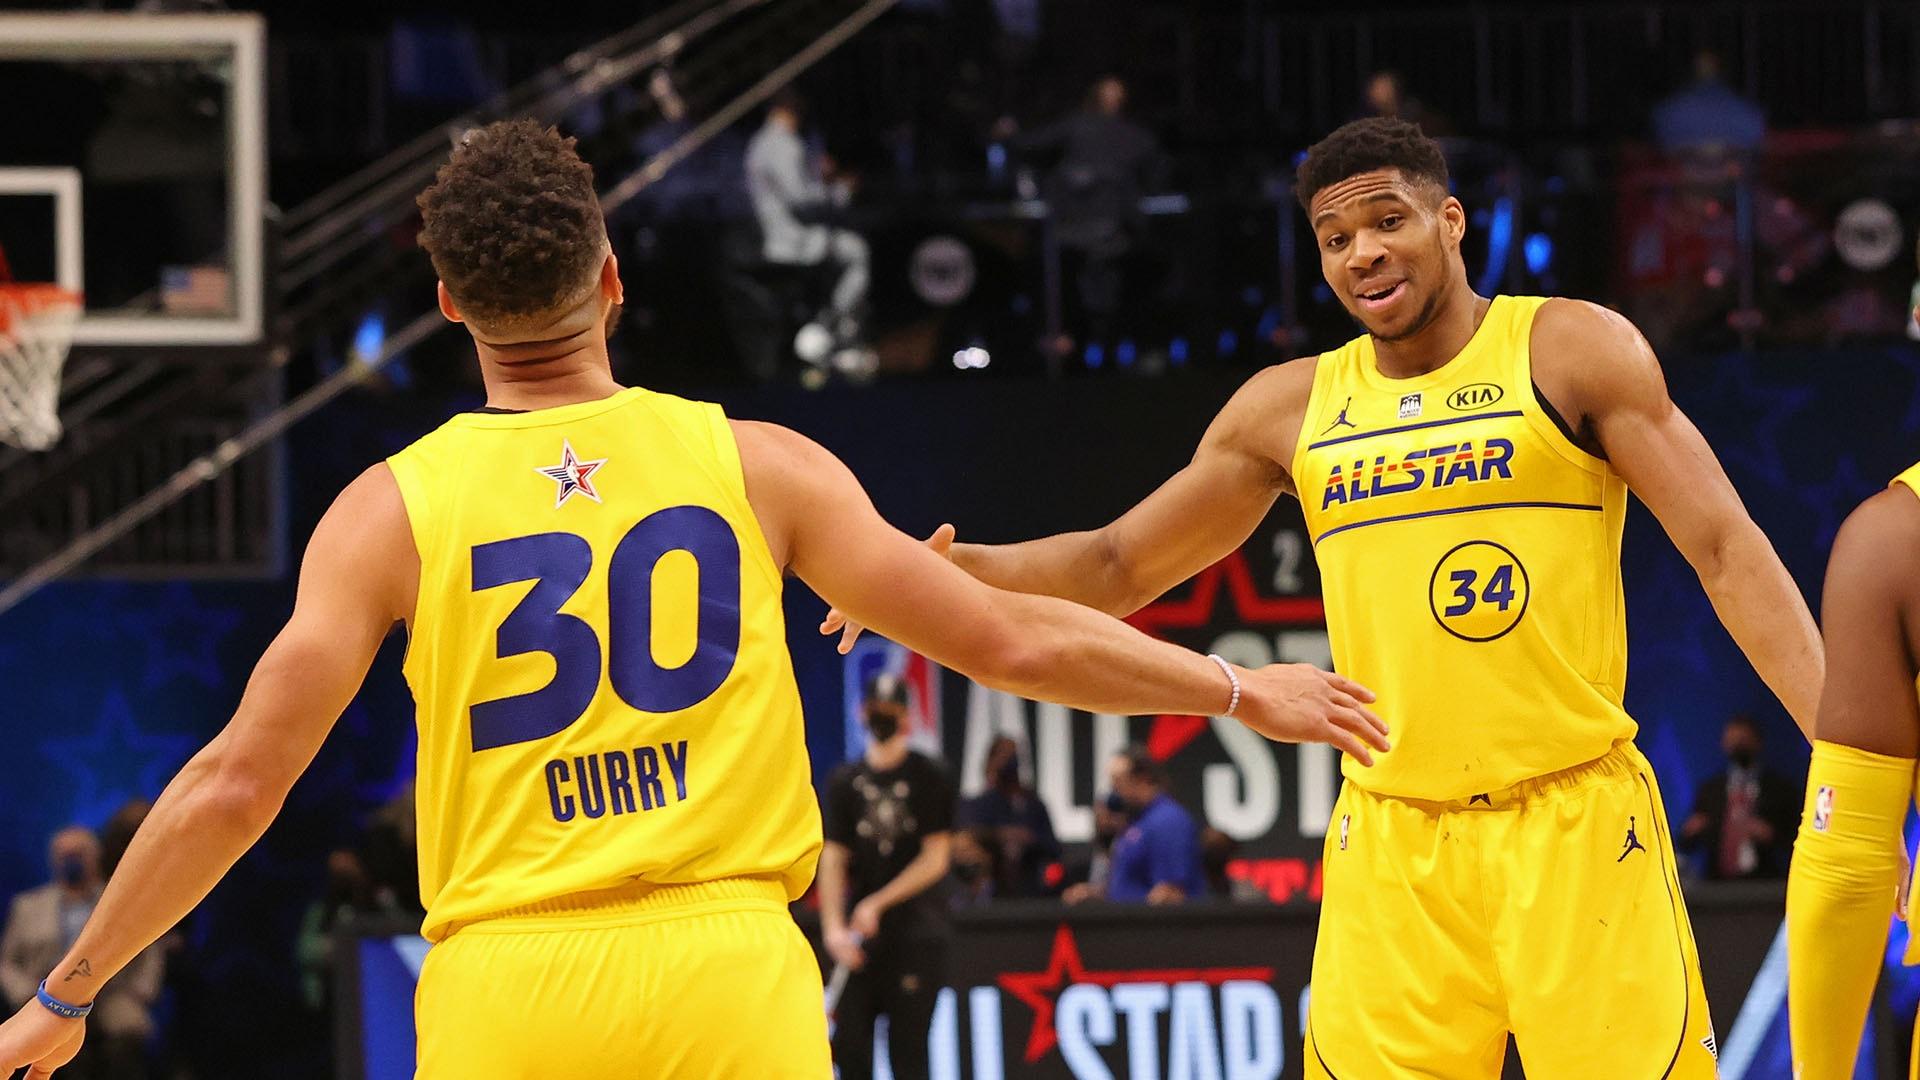 Giannis, Curry lead Team LeBron past Team Durant